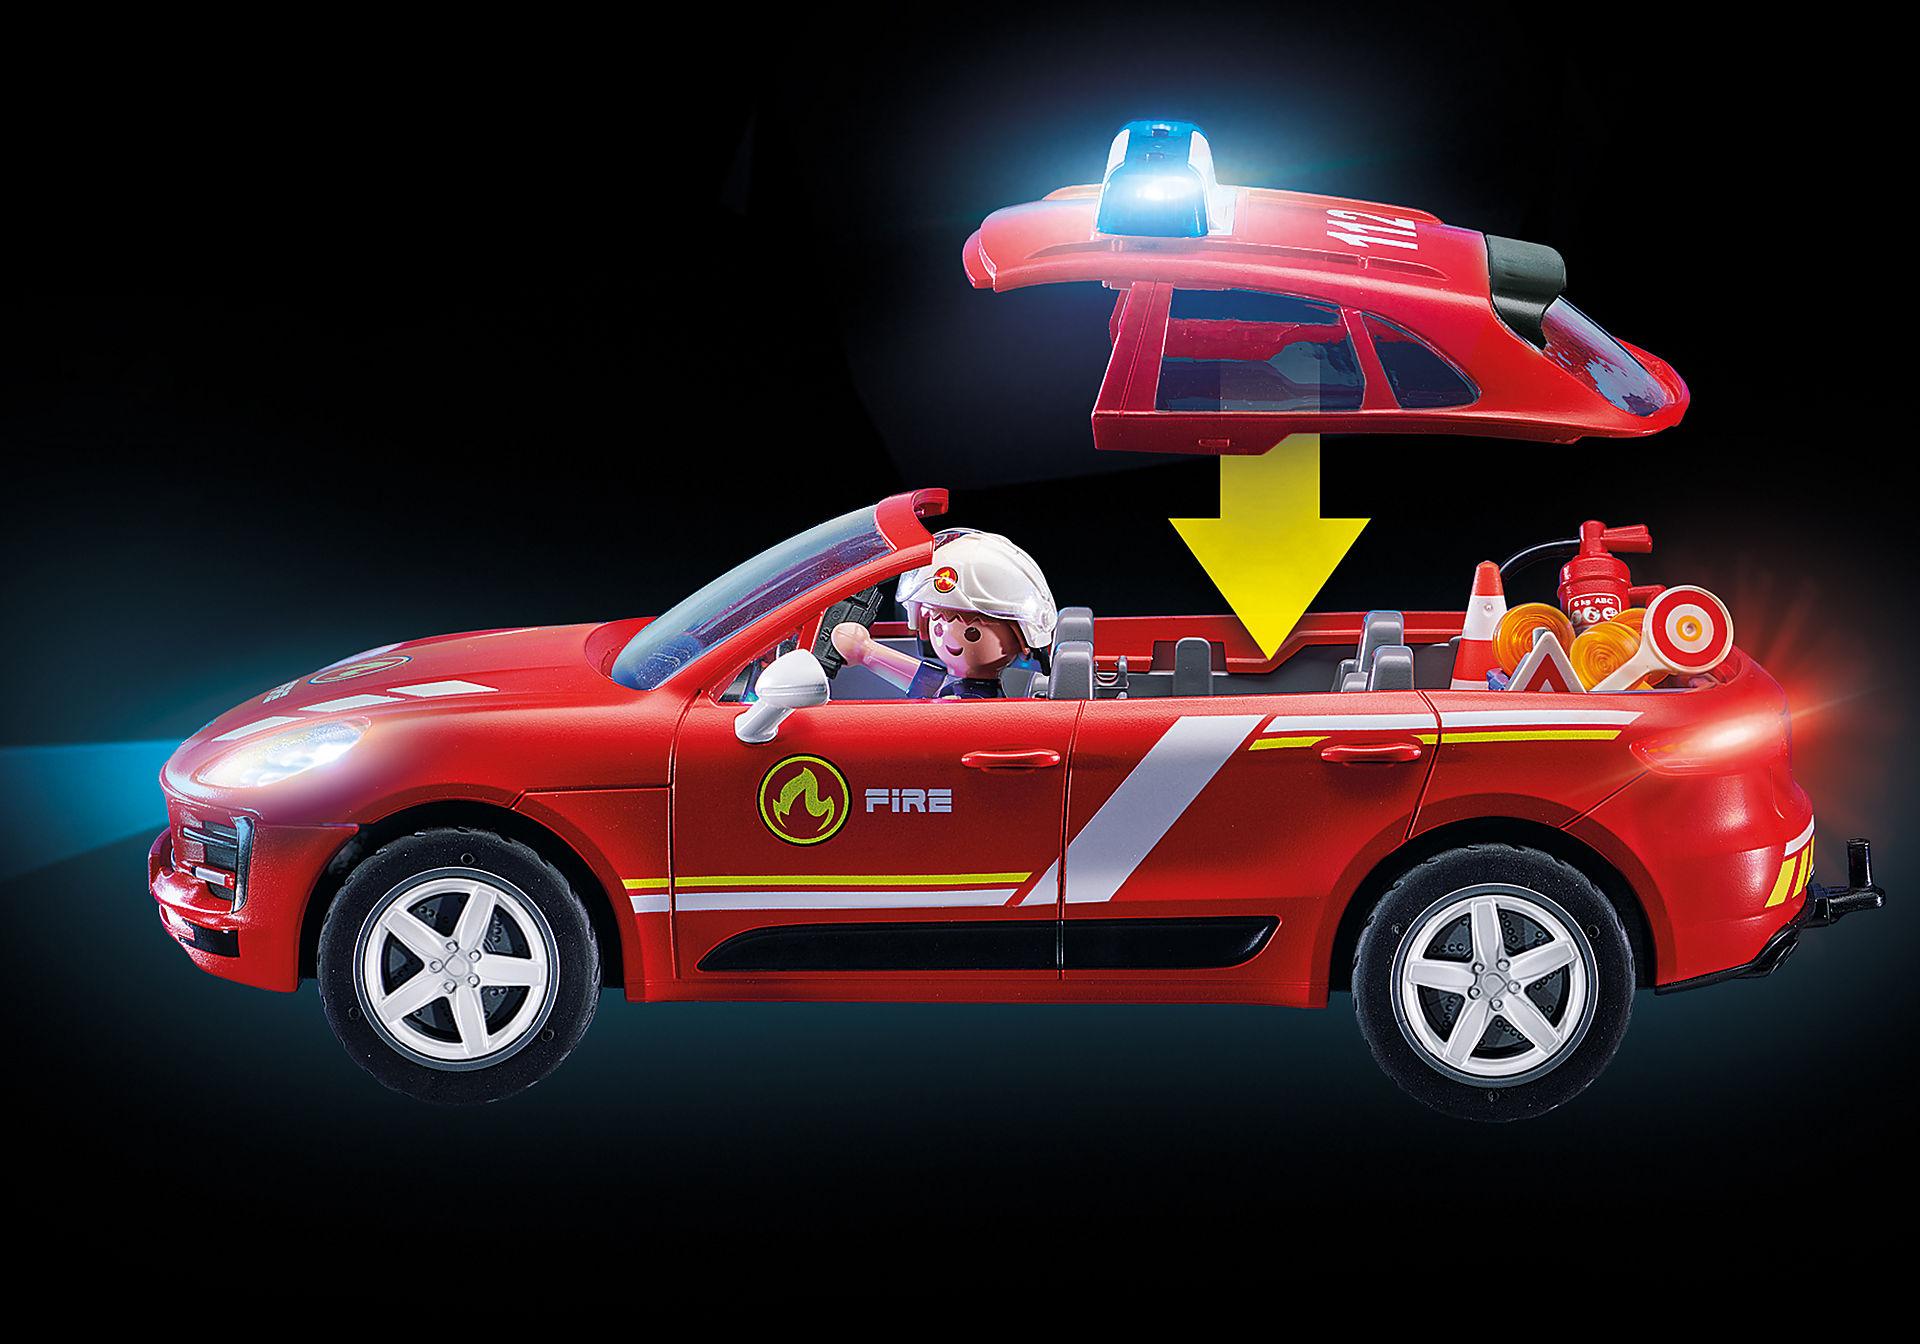 70277 Porsche Macan Fire Brigade zoom image6